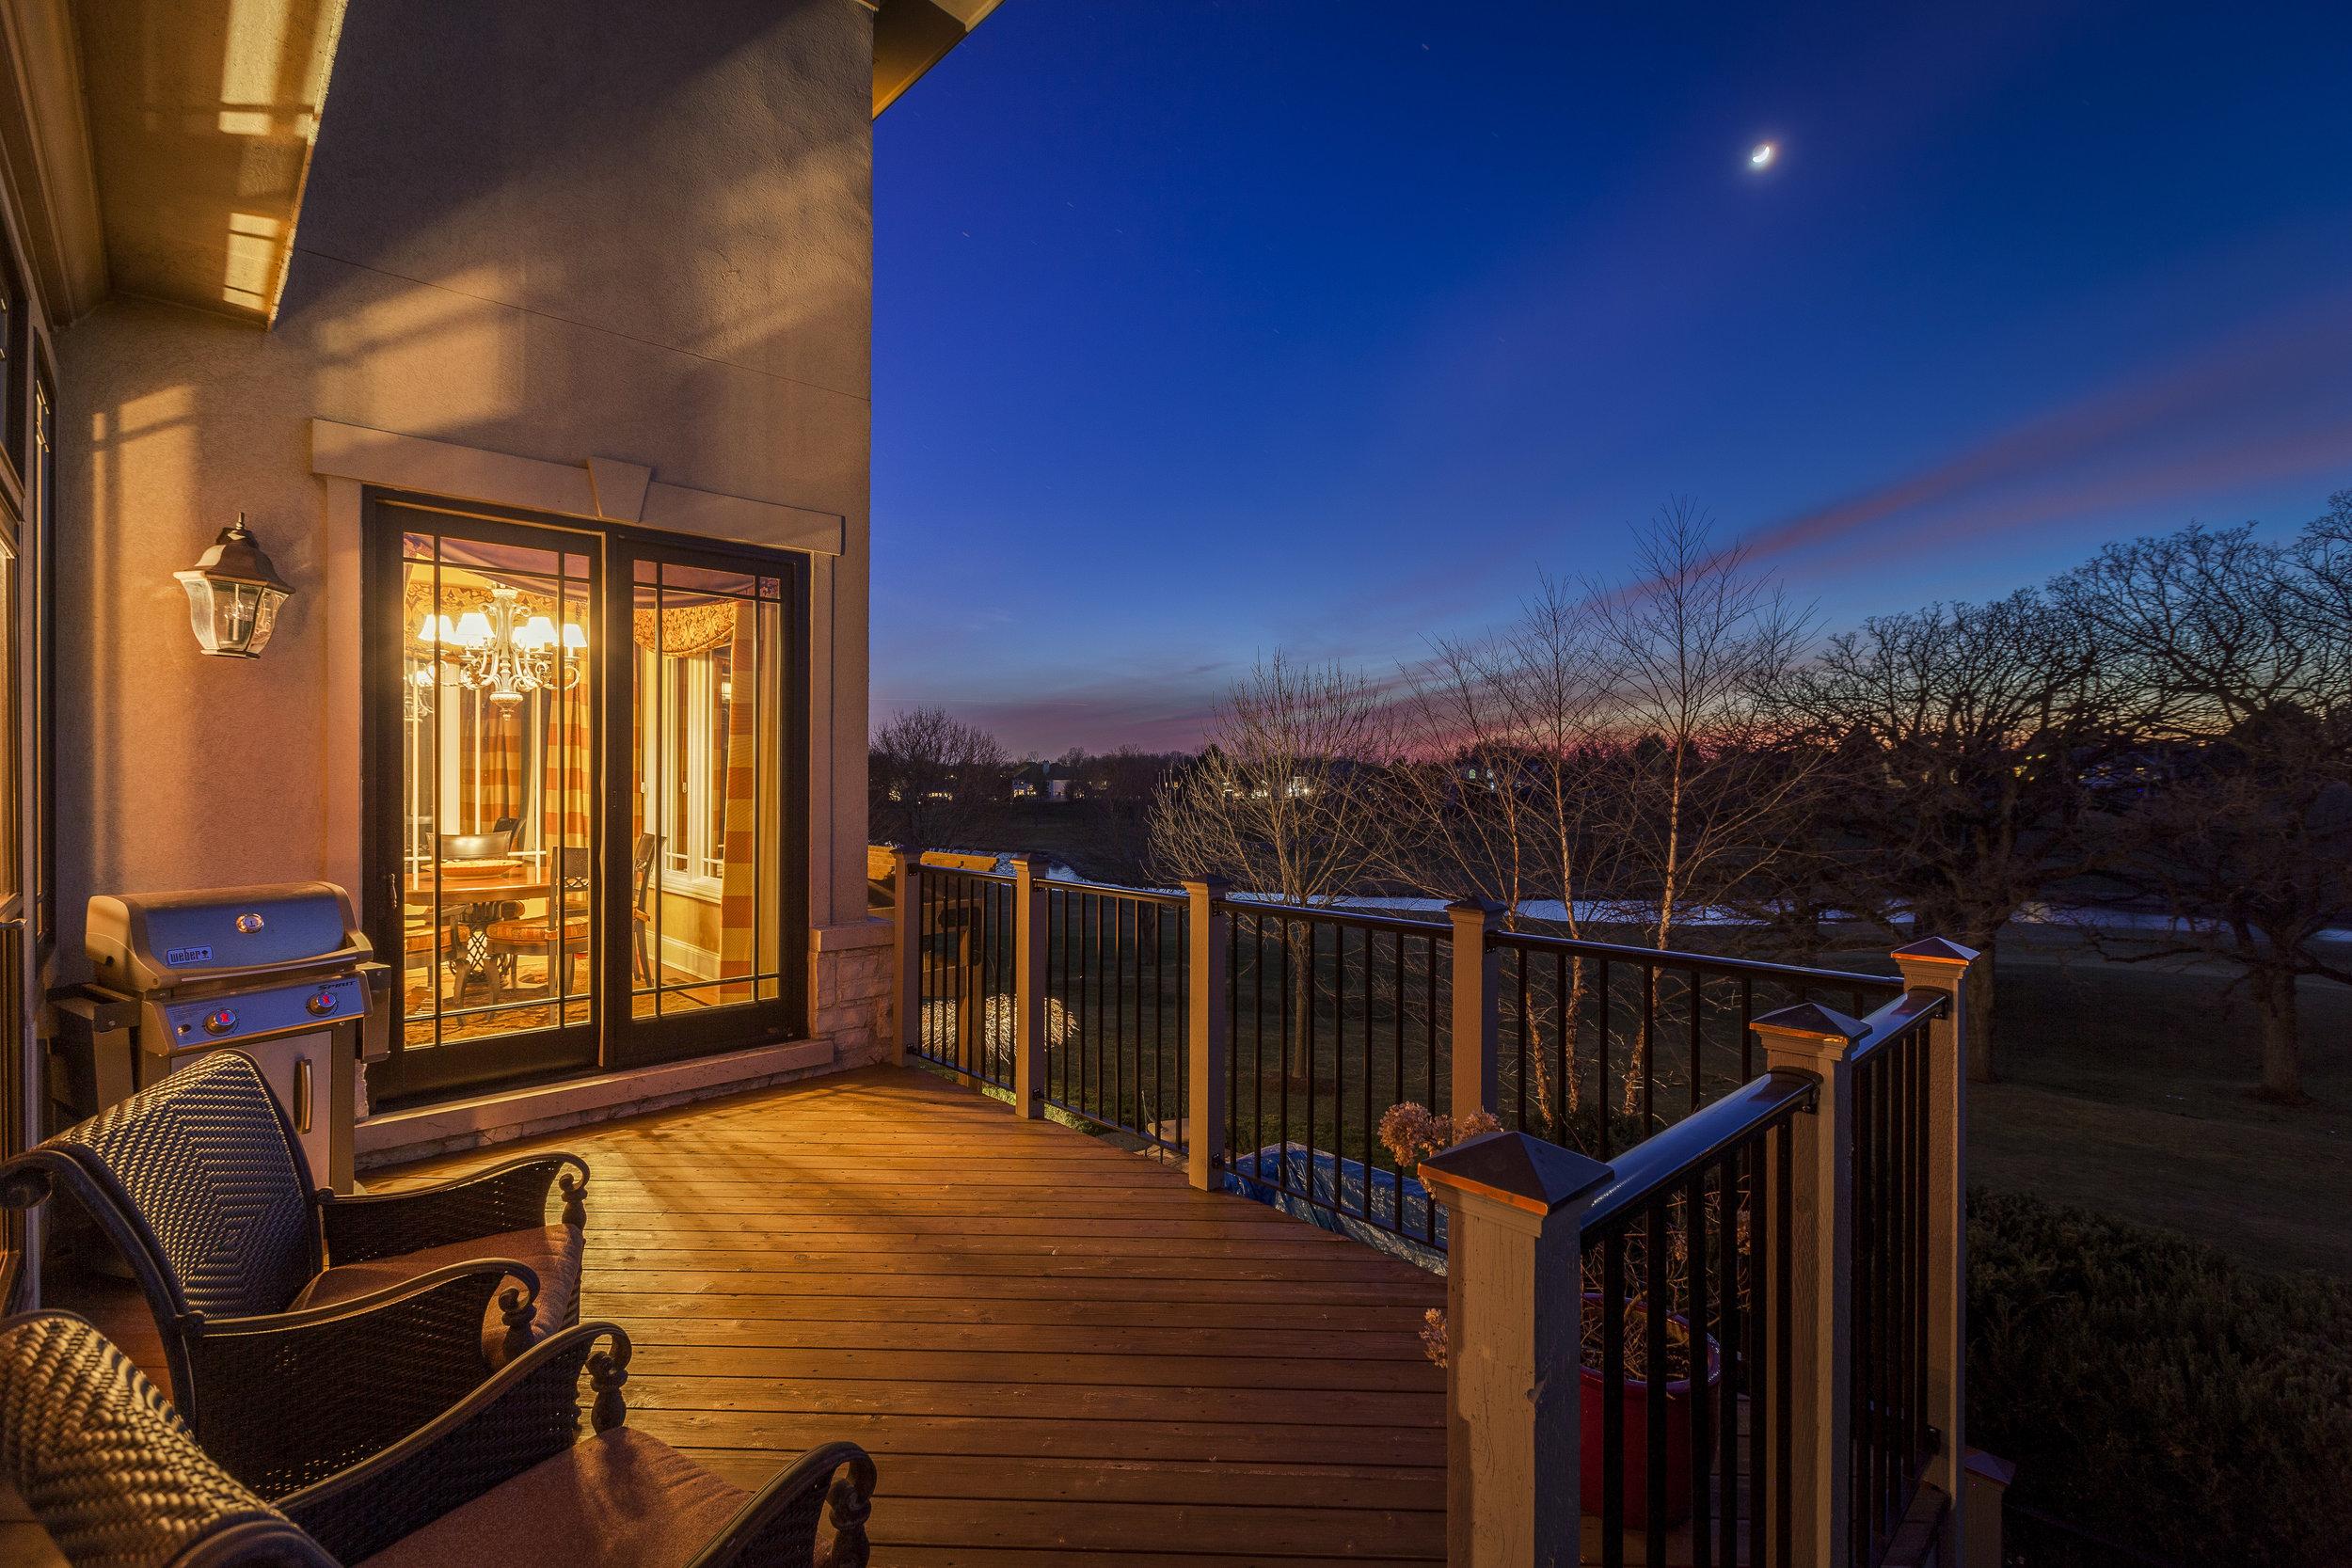 domophotos real estate twilight photography - Nashville, TN